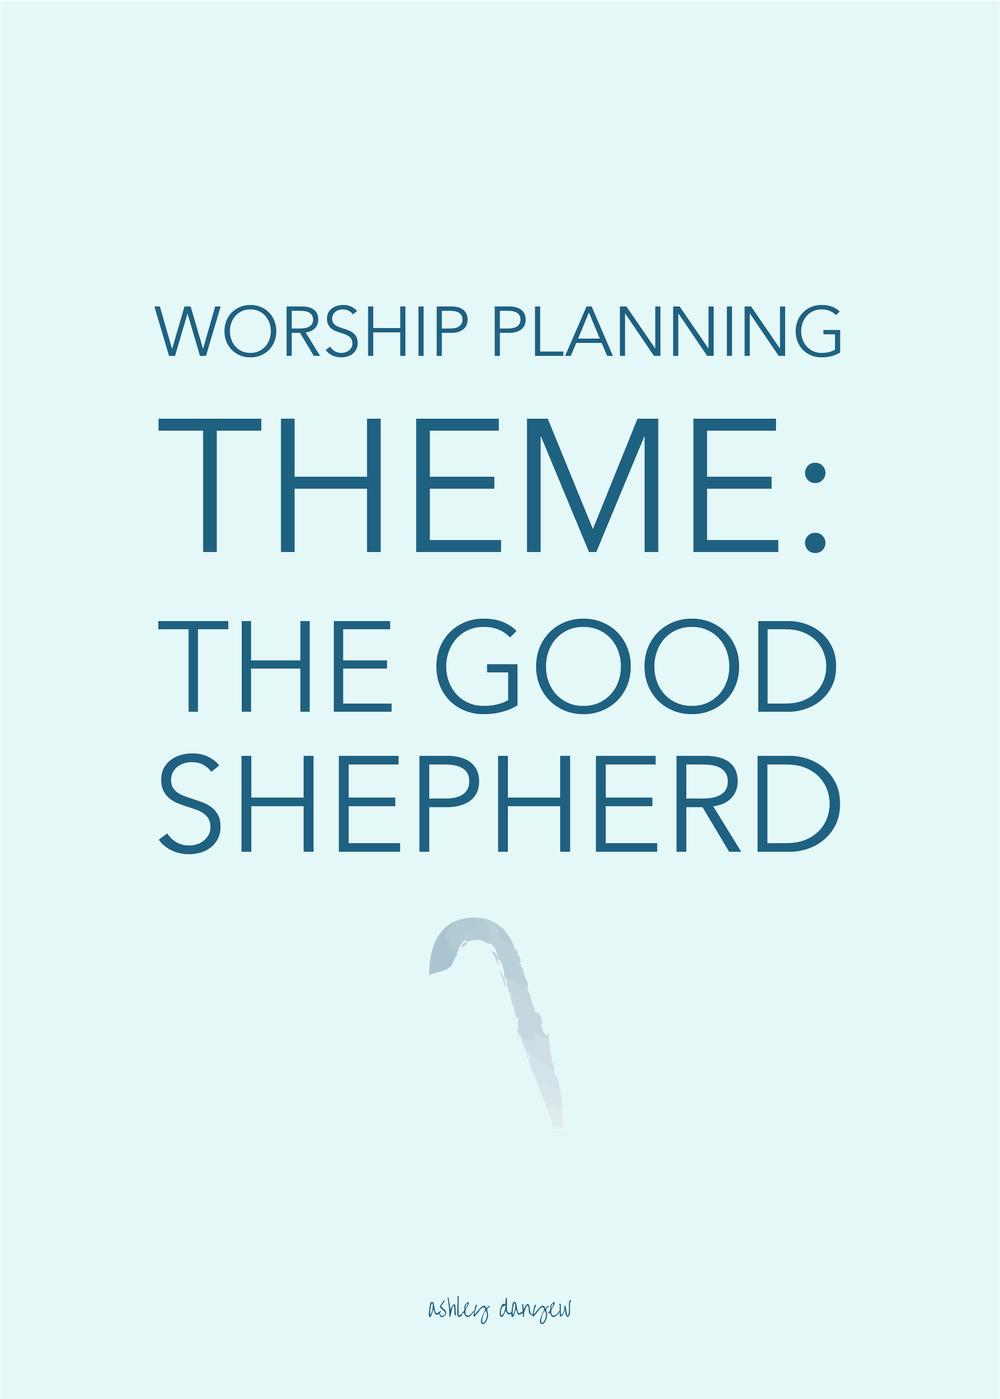 Worship Planning Theme: The Good Shepherd